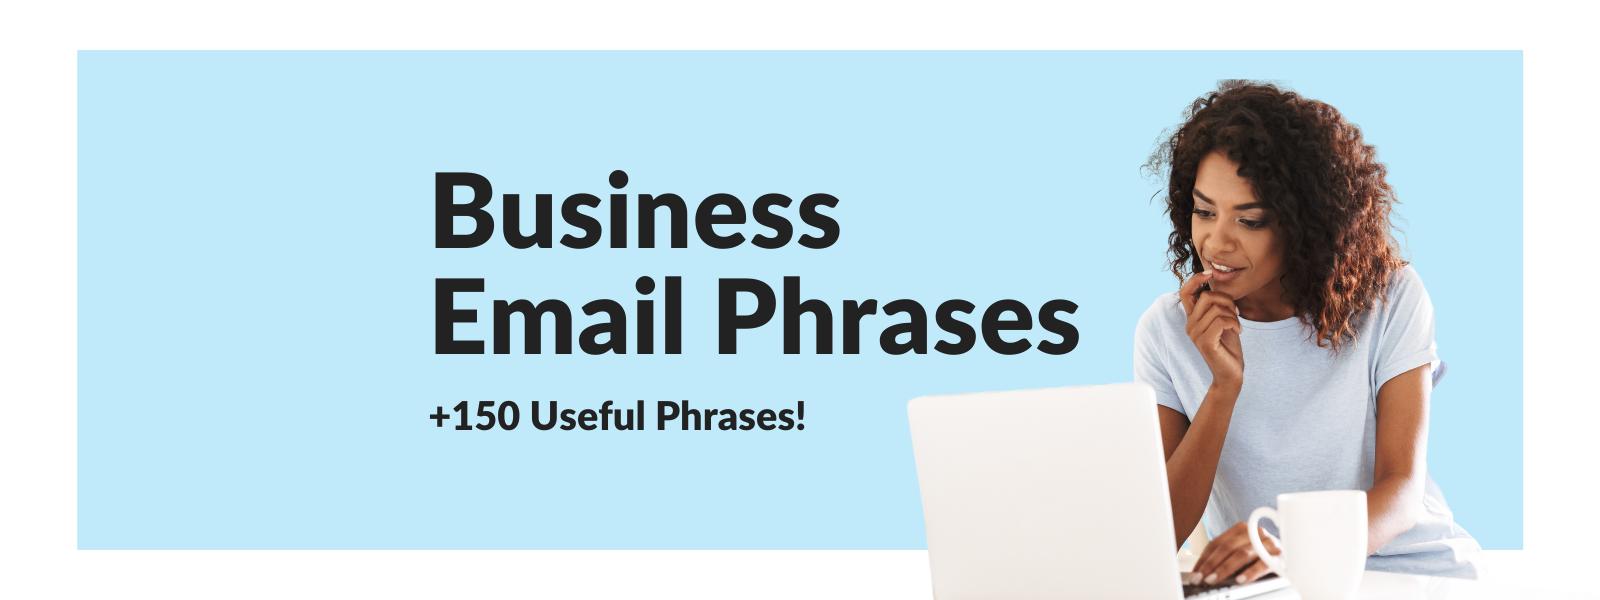 Useful Business Email Phrases | Talaera Business English Training